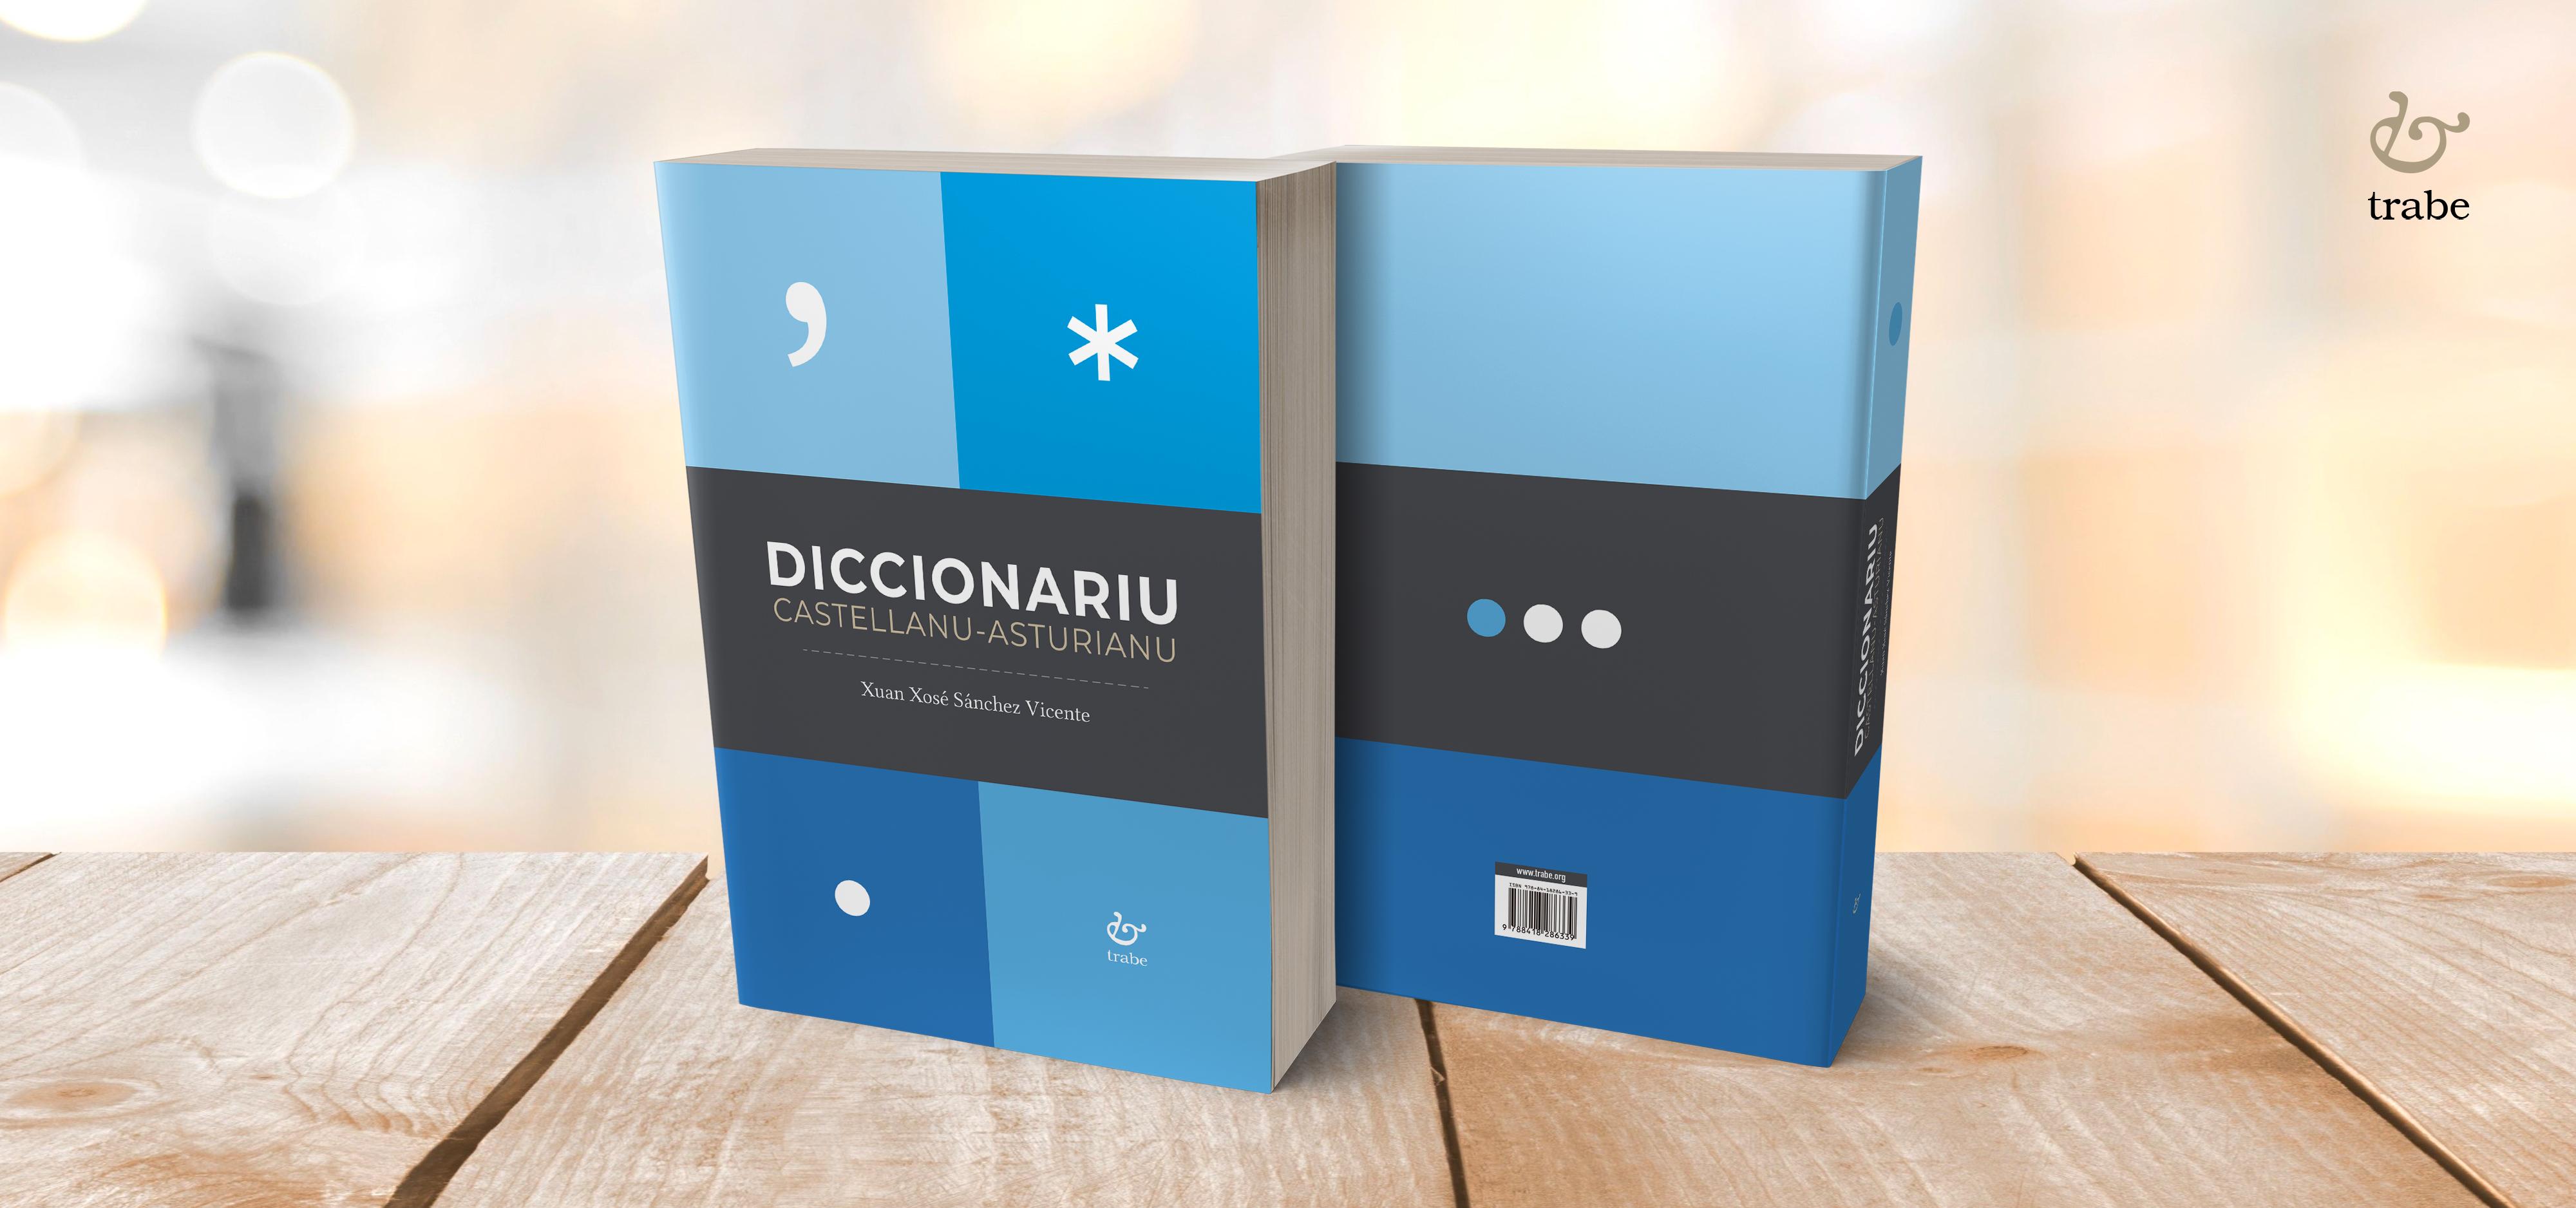 Diccionariu-Cast-Ast